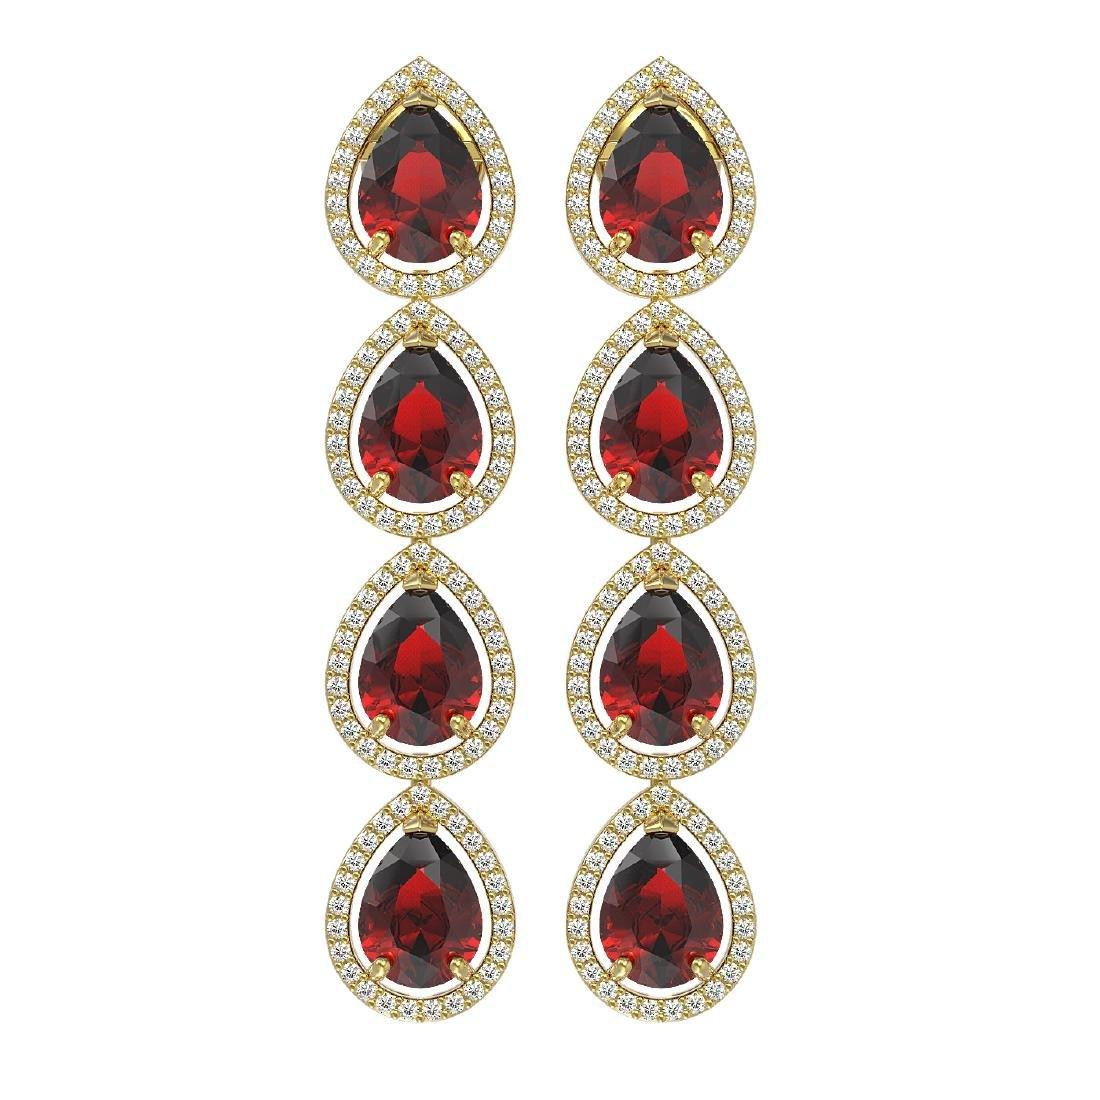 9.25 CTW Garnet & Diamond Halo Earrings 10K Yellow Gold